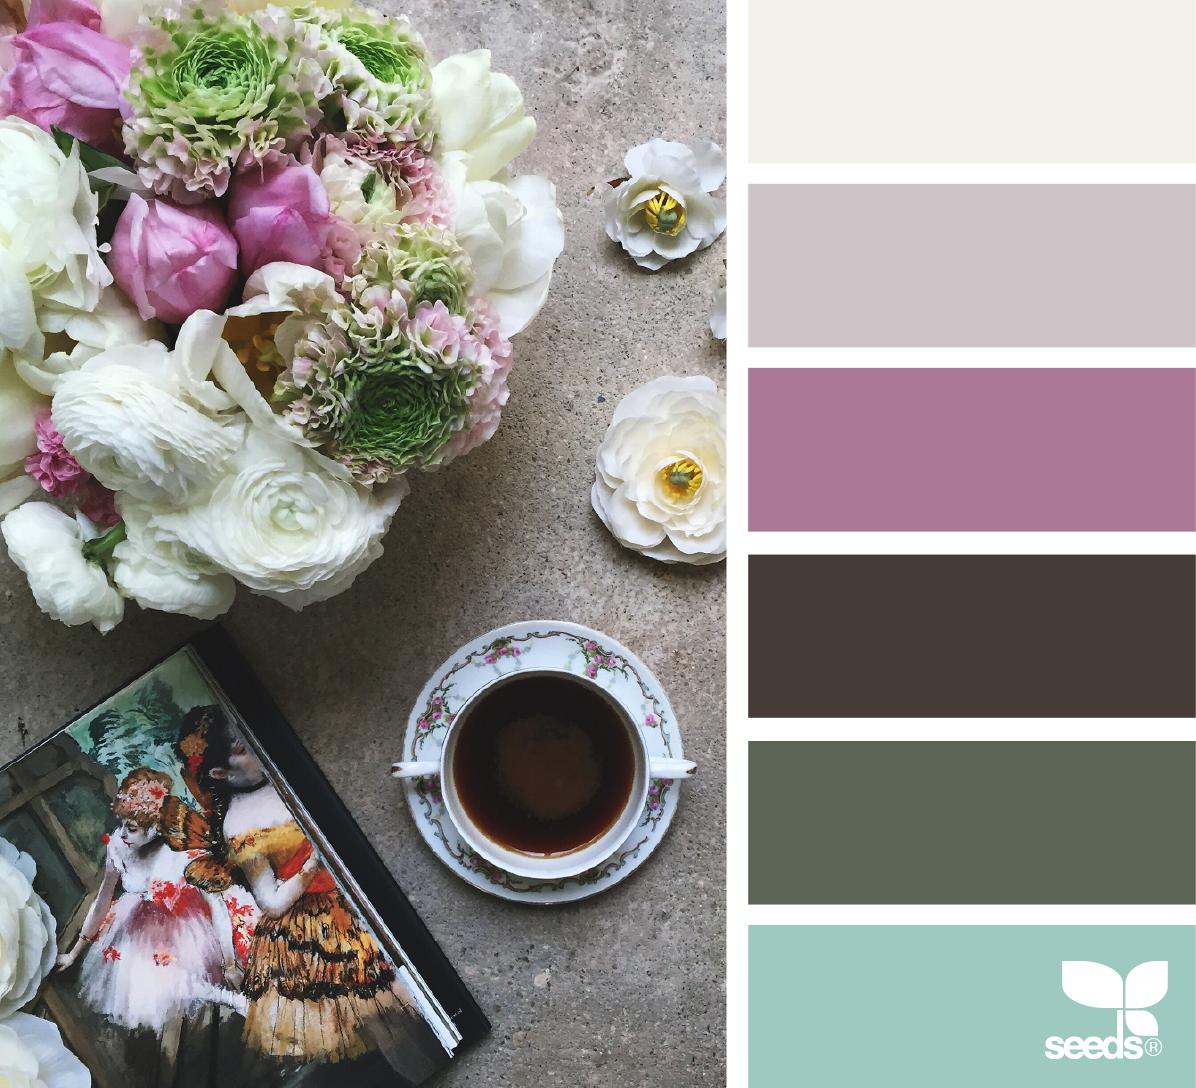 Color Arrange - http://design-seeds.com/home/entry/color-arrange1